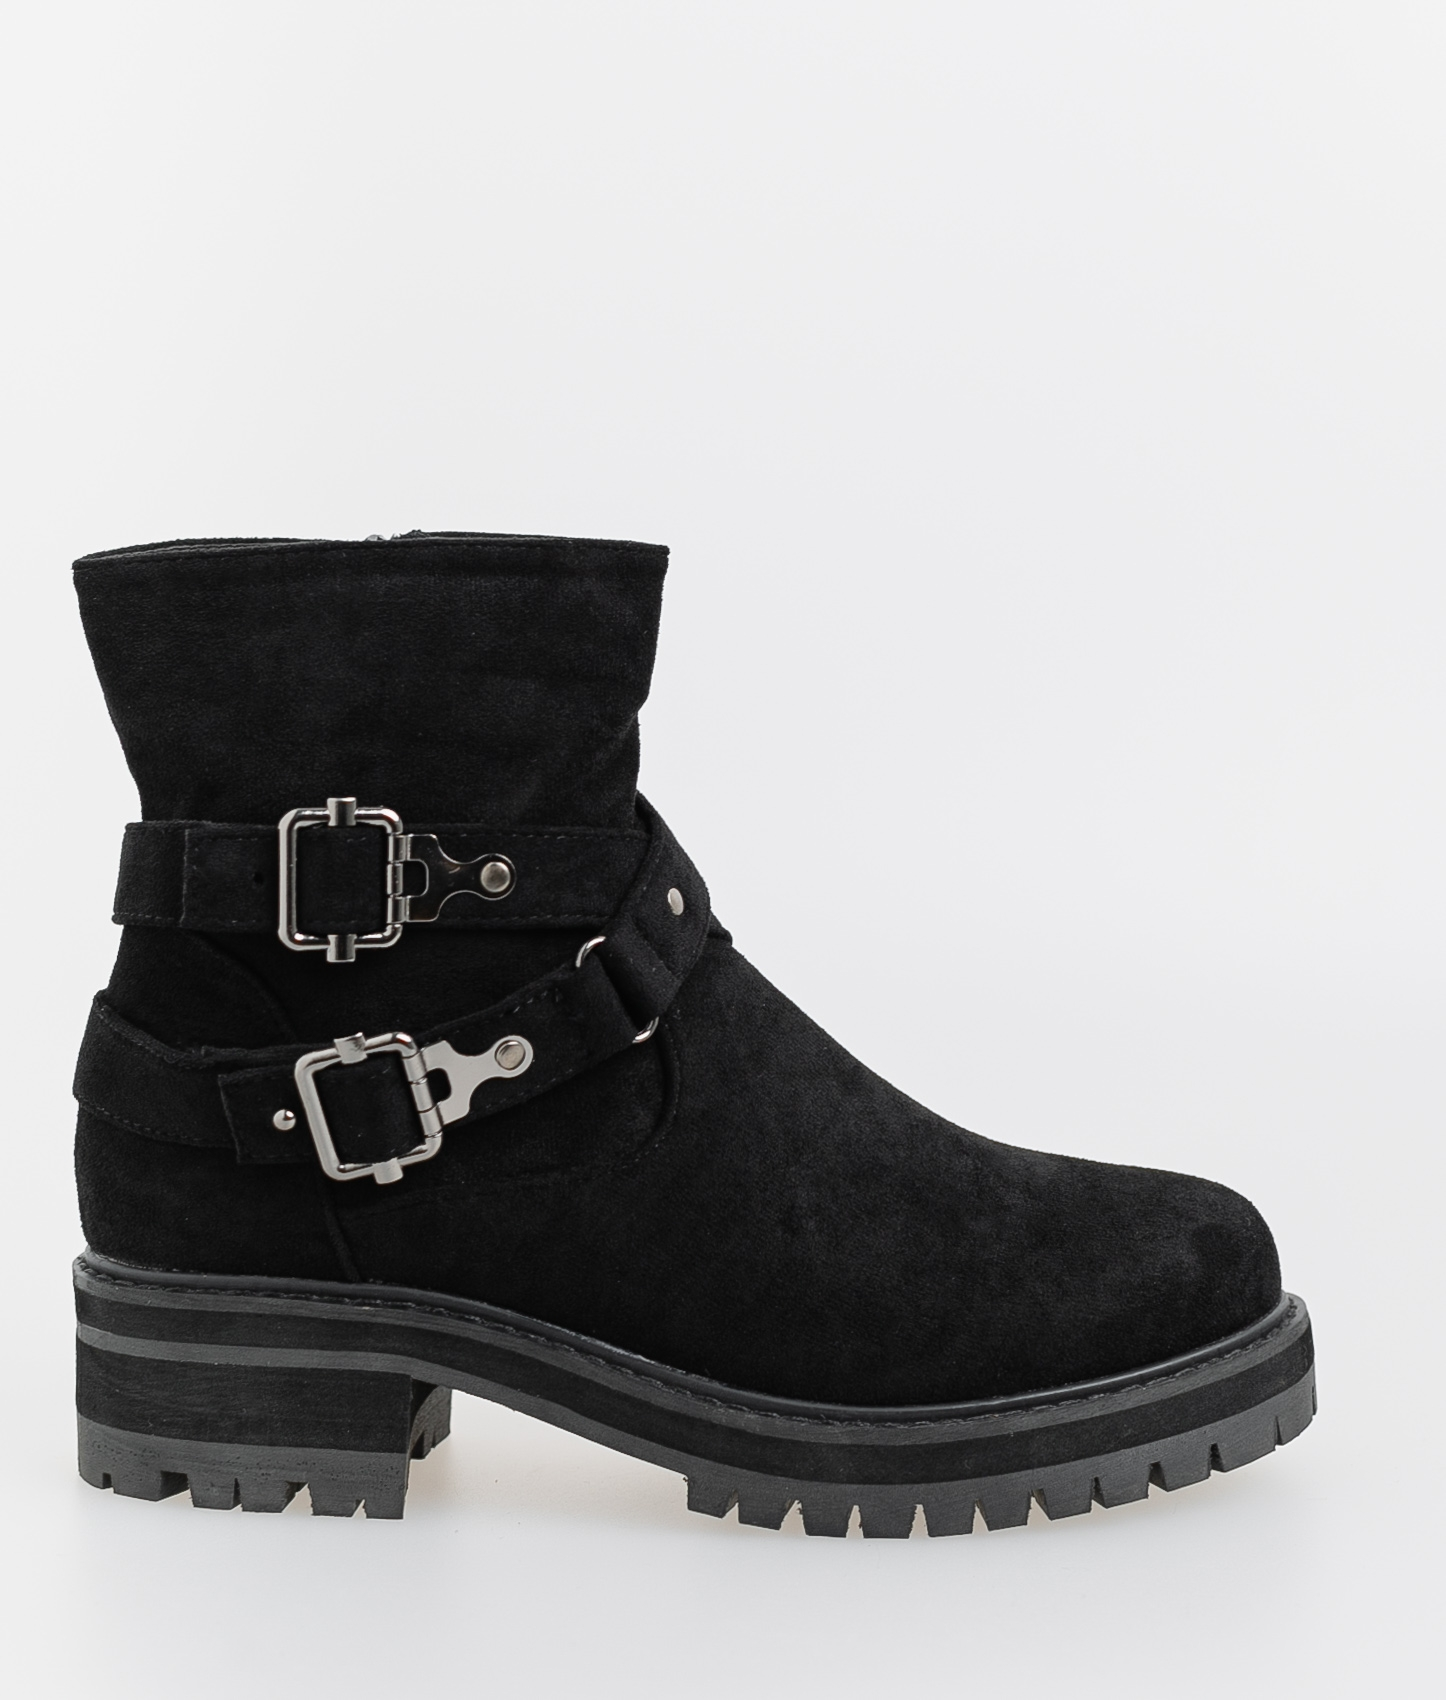 Brati Low Boot - Black